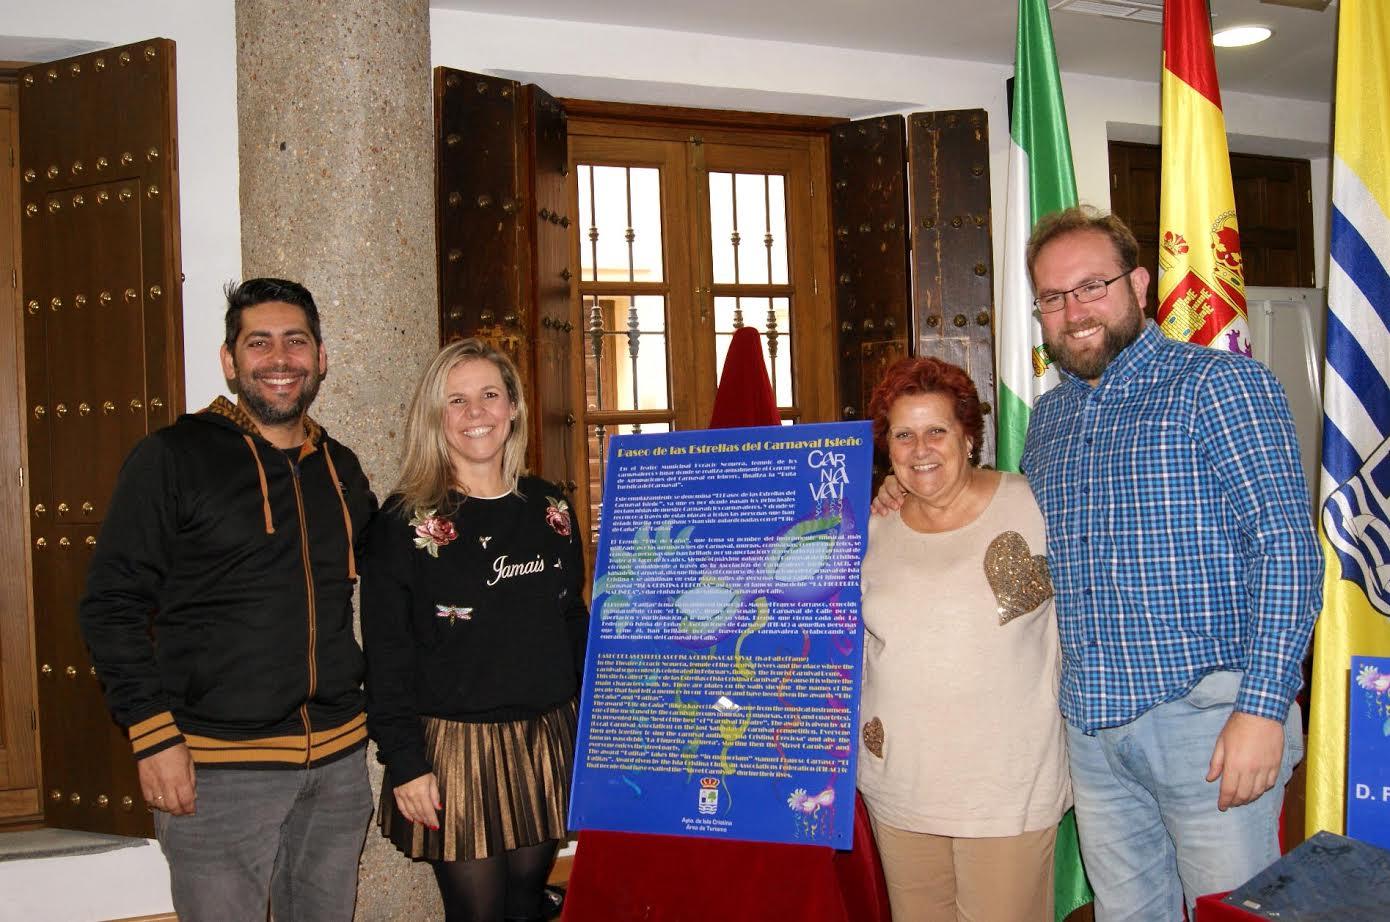 Presentada la 'Ruta del Carnaval Isleño'